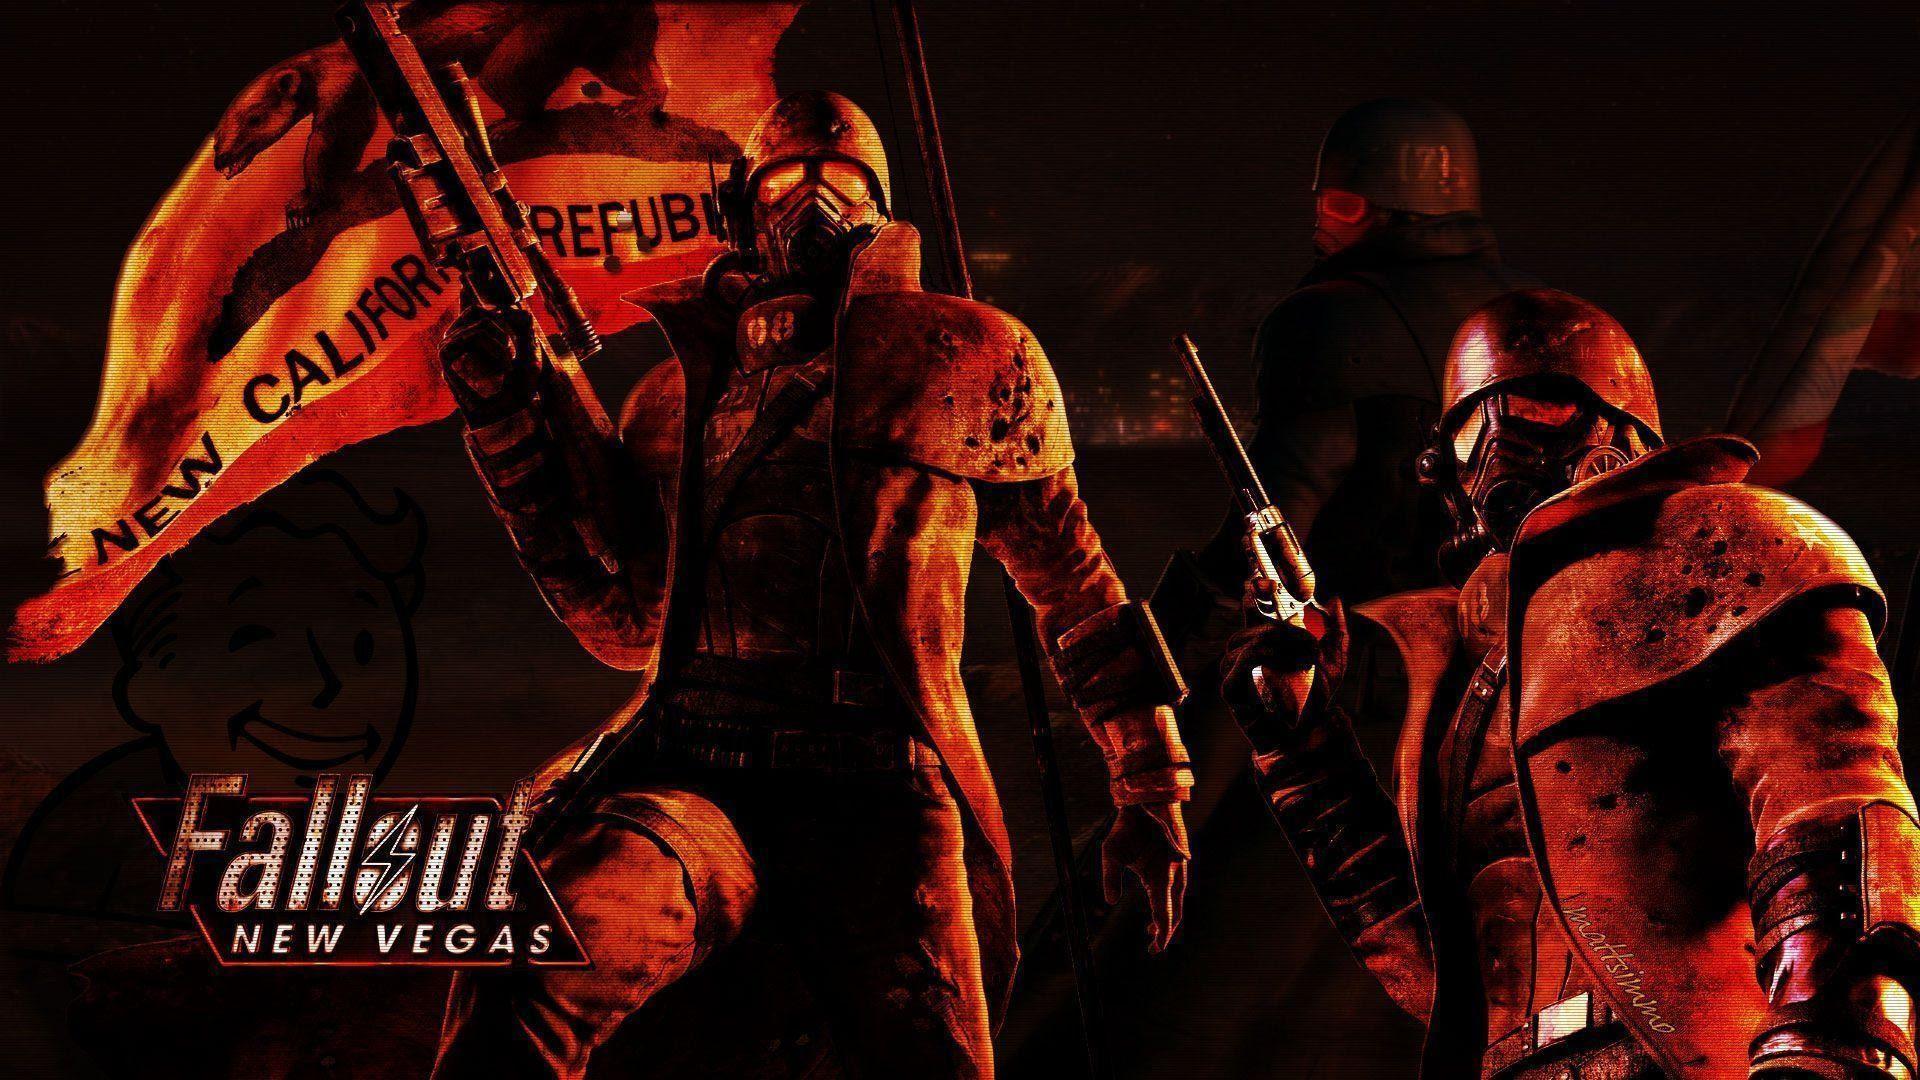 Fallout New Vegas Wallpaper 1080p 82 Images